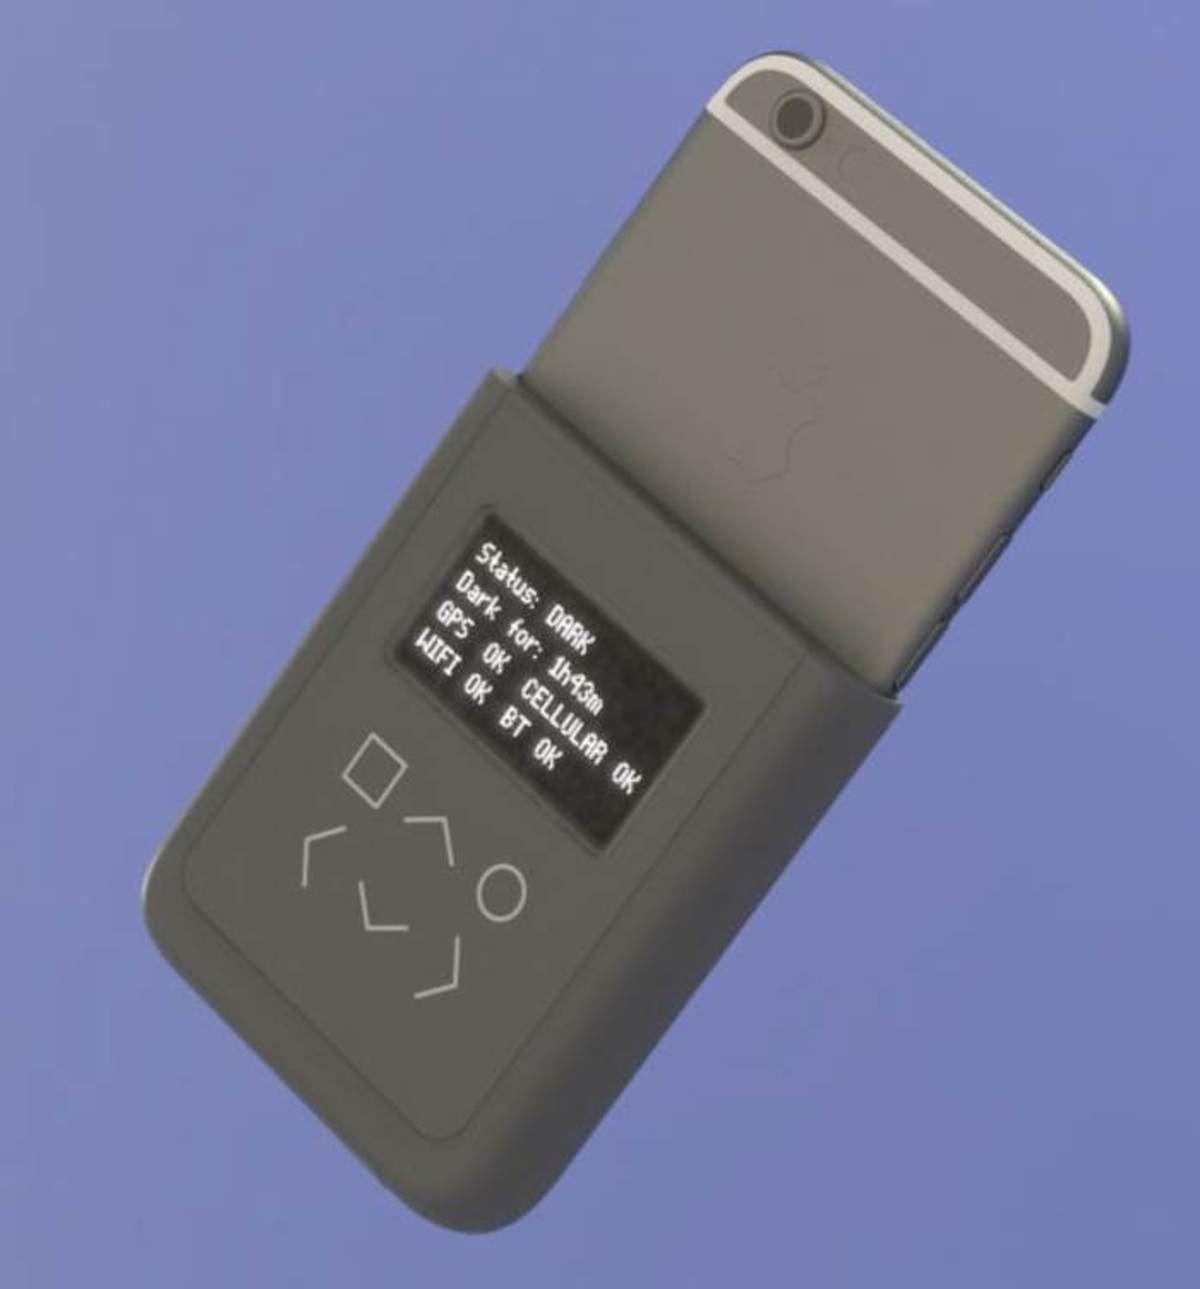 Snowden crea funda antiespionaje para iPhone